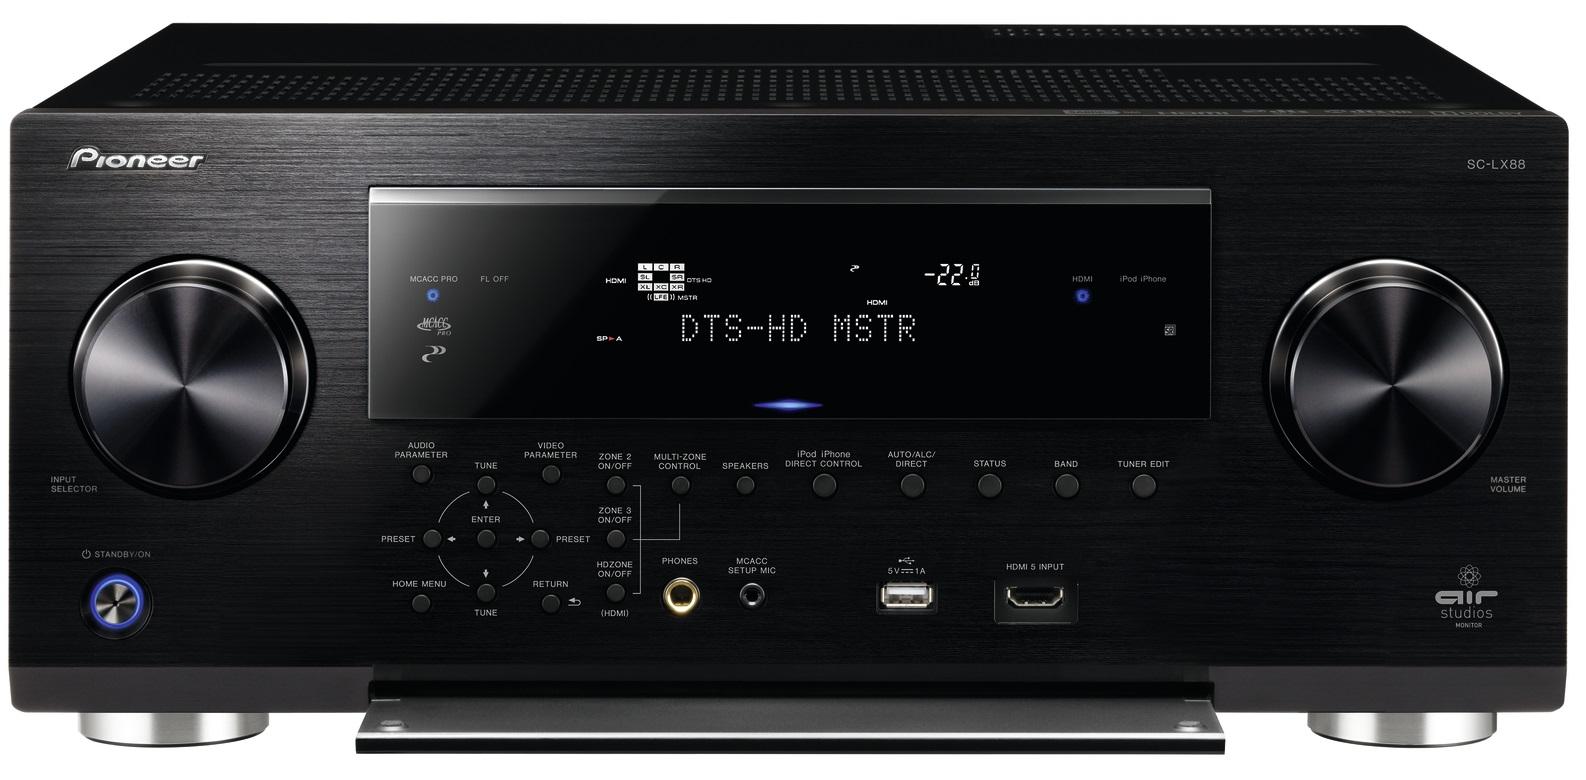 Pioneer SC-LX88, SC-LX78 und SC-LX58: 4k Receiver mit Dolby Atmos